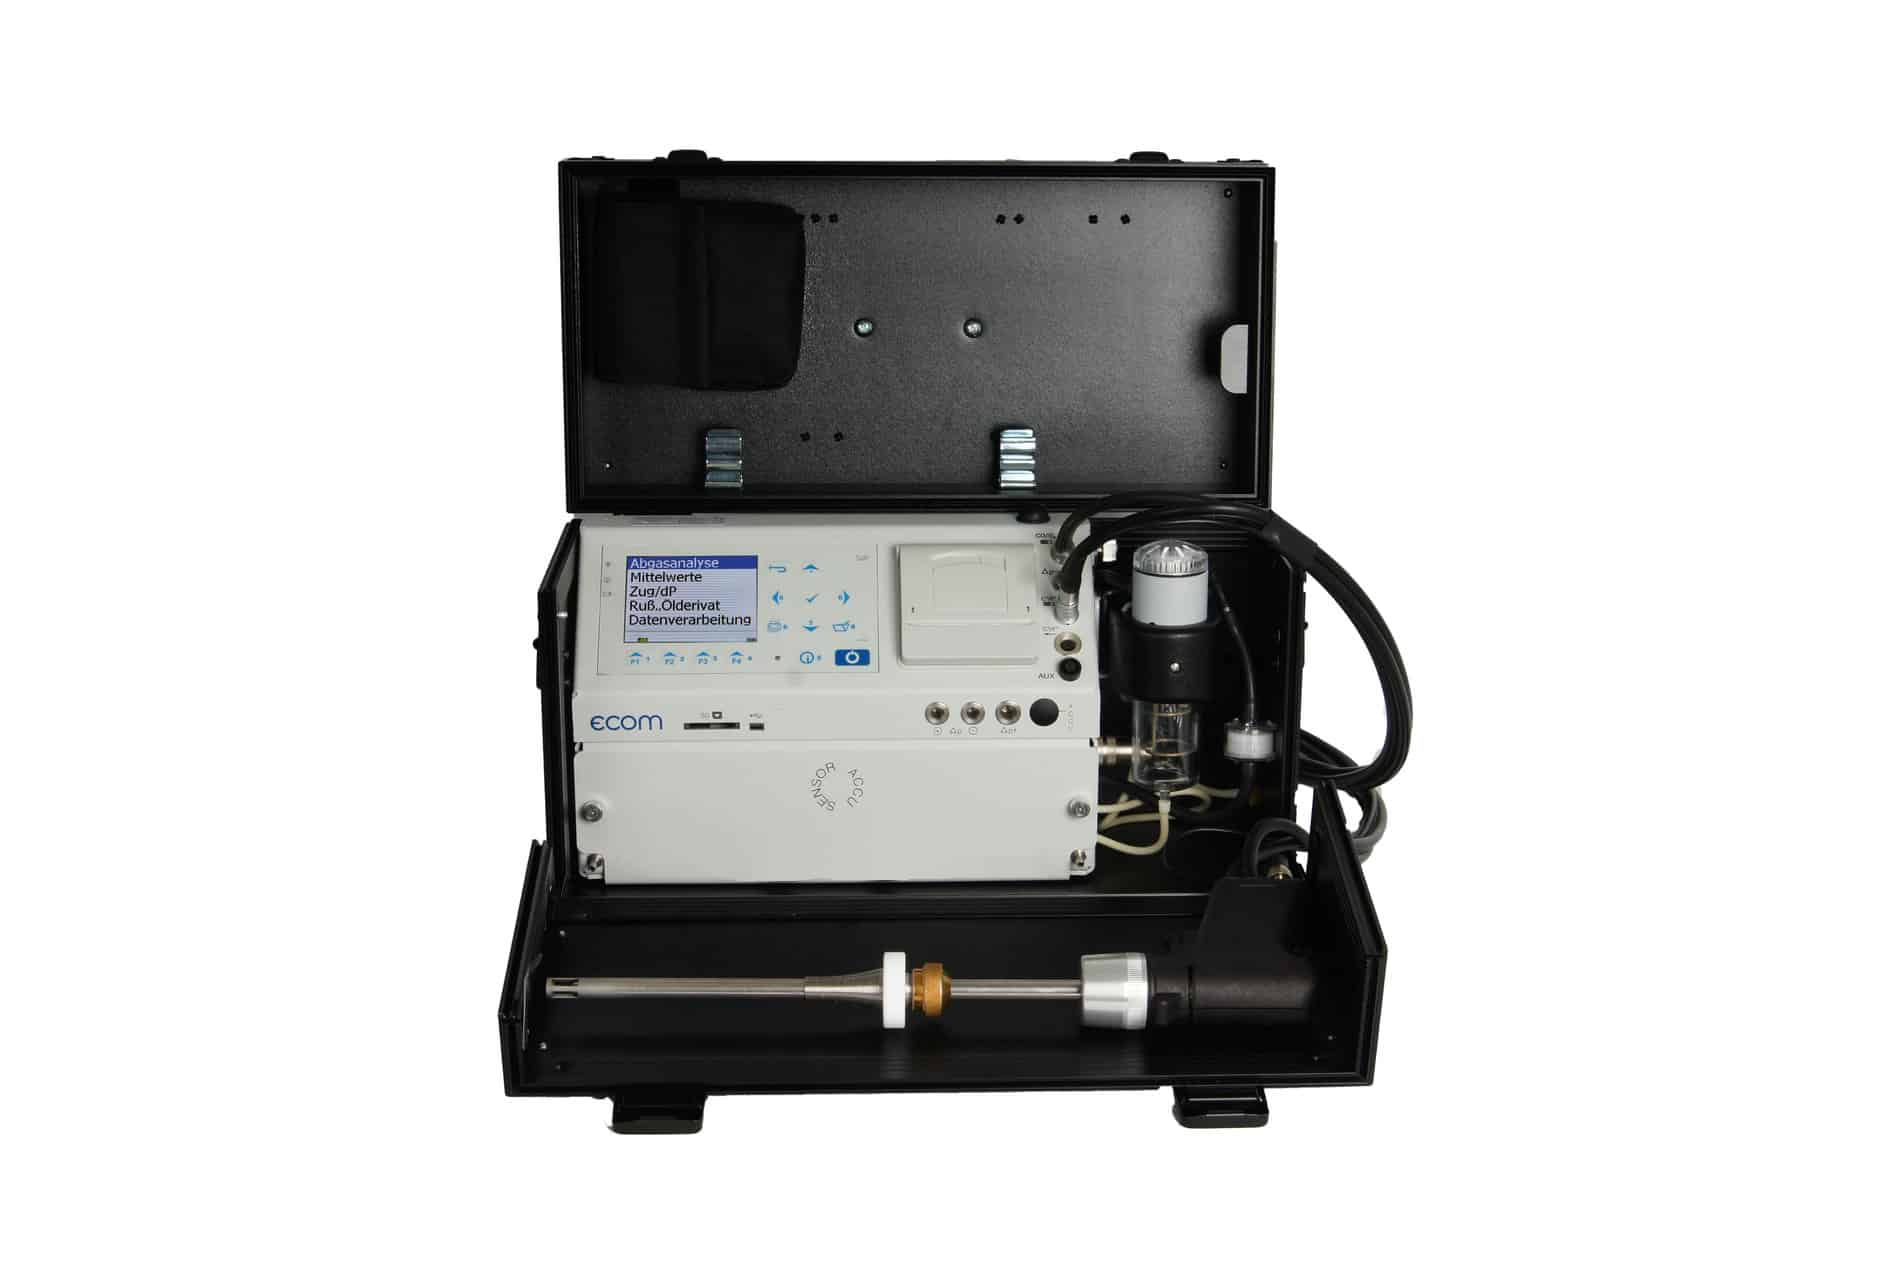 ecom-EN3-R Abgasanalysegerät mit integrierter Rußmessung